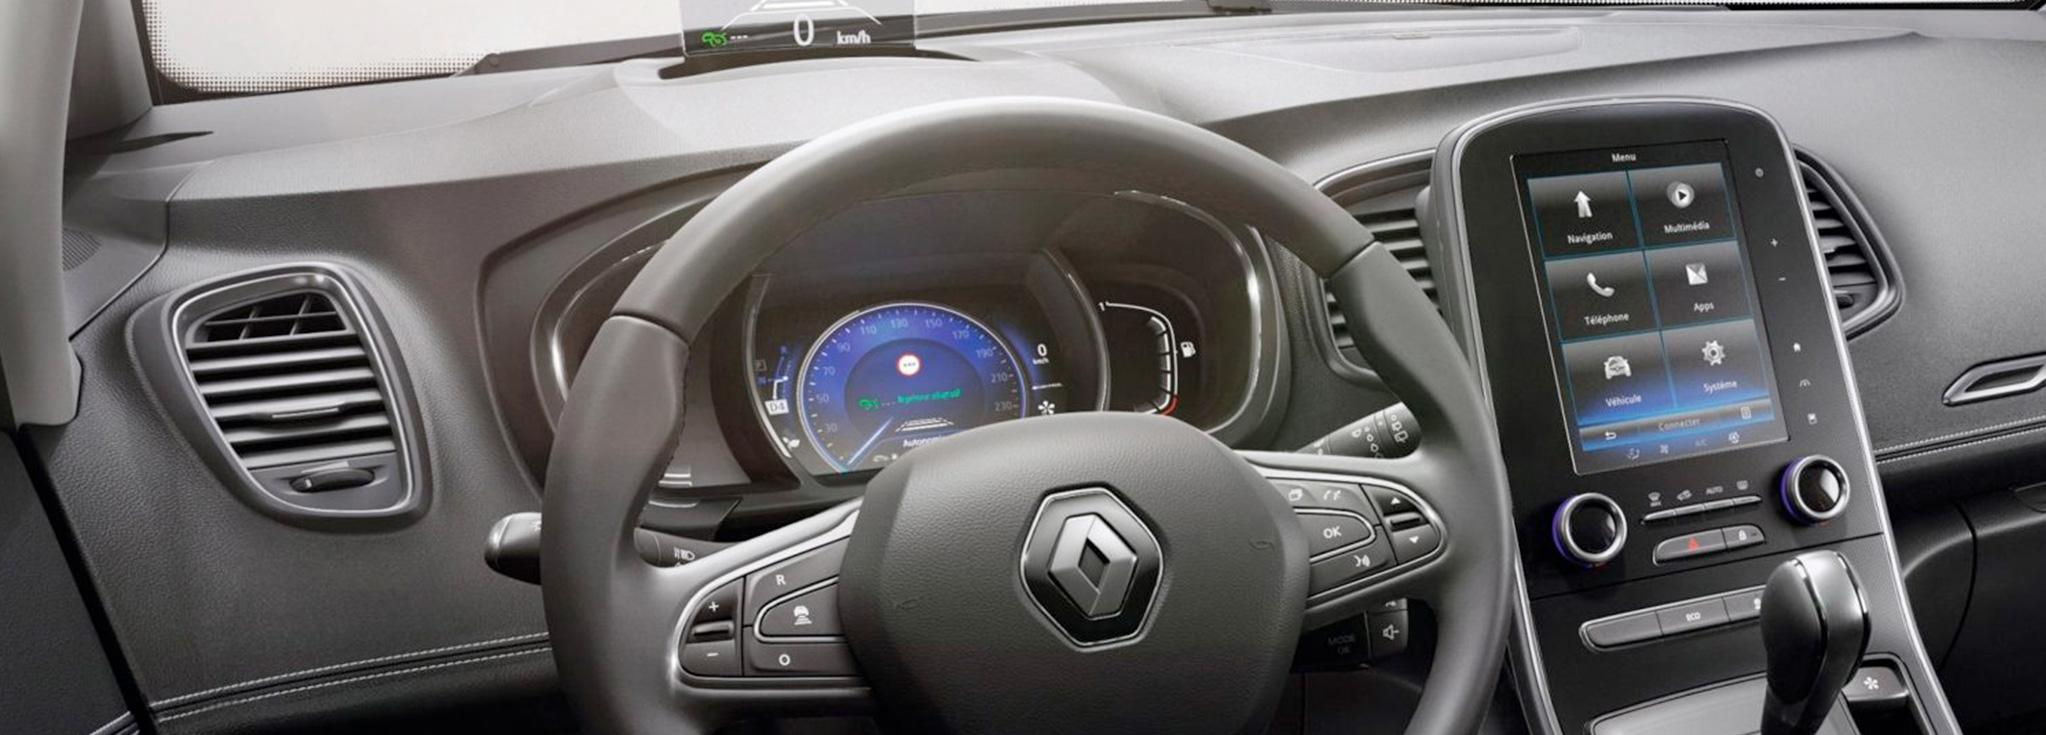 Consola Interior del Renault Grand Scénic